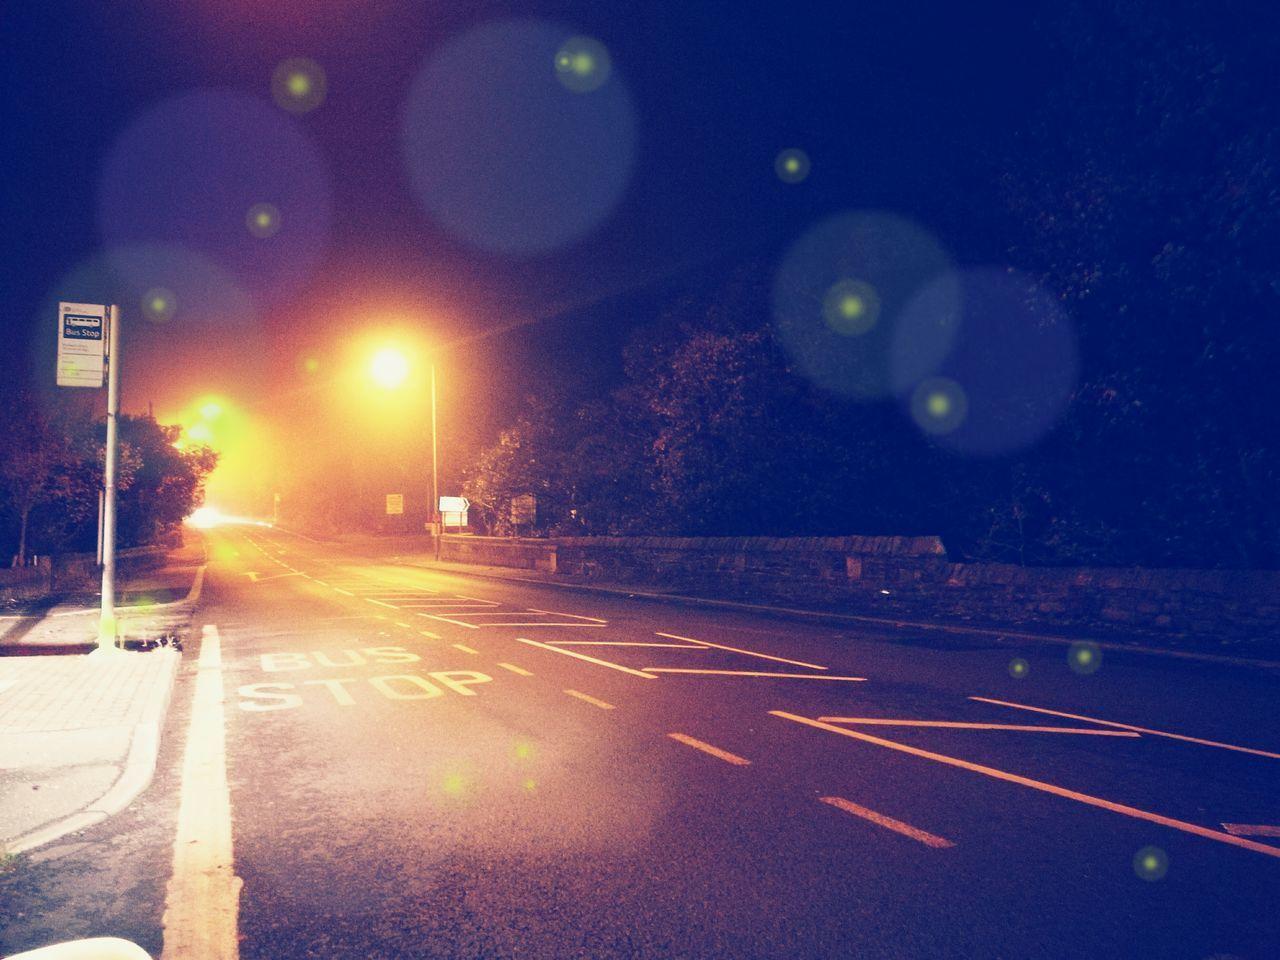 night, lens flare, road, illuminated, speed, no people, outdoors, moon, sky, city